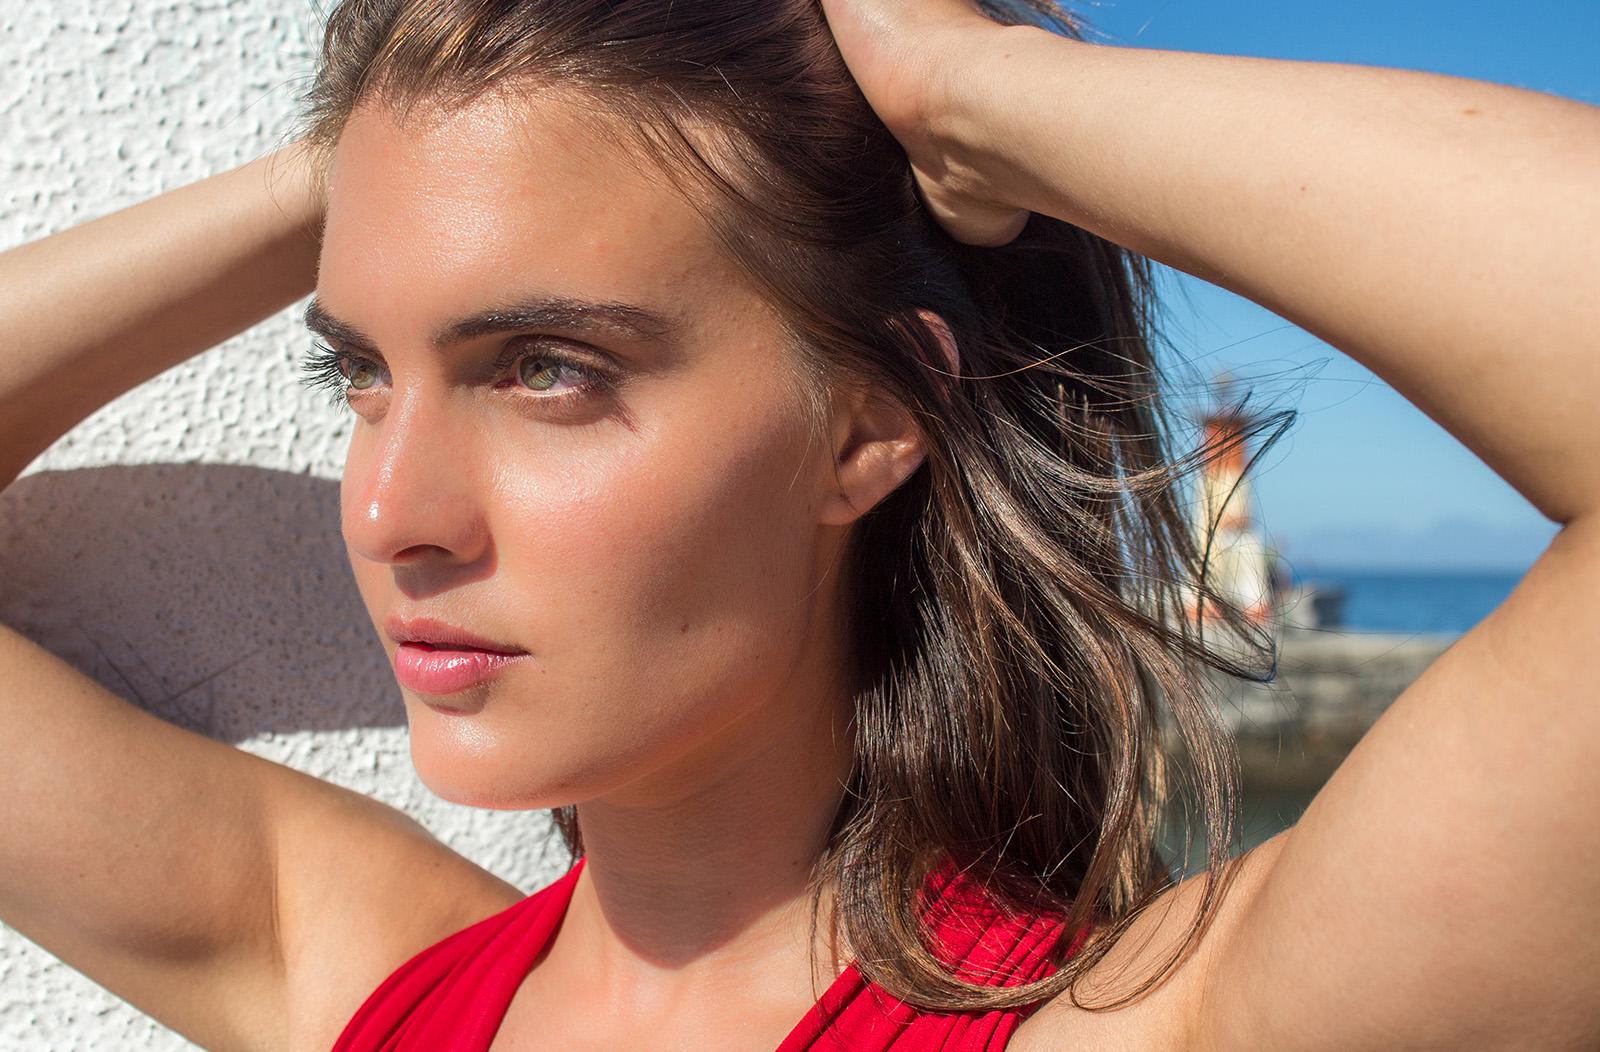 fashion-shoot-Model-Sarah-Richards IMG_3146 w